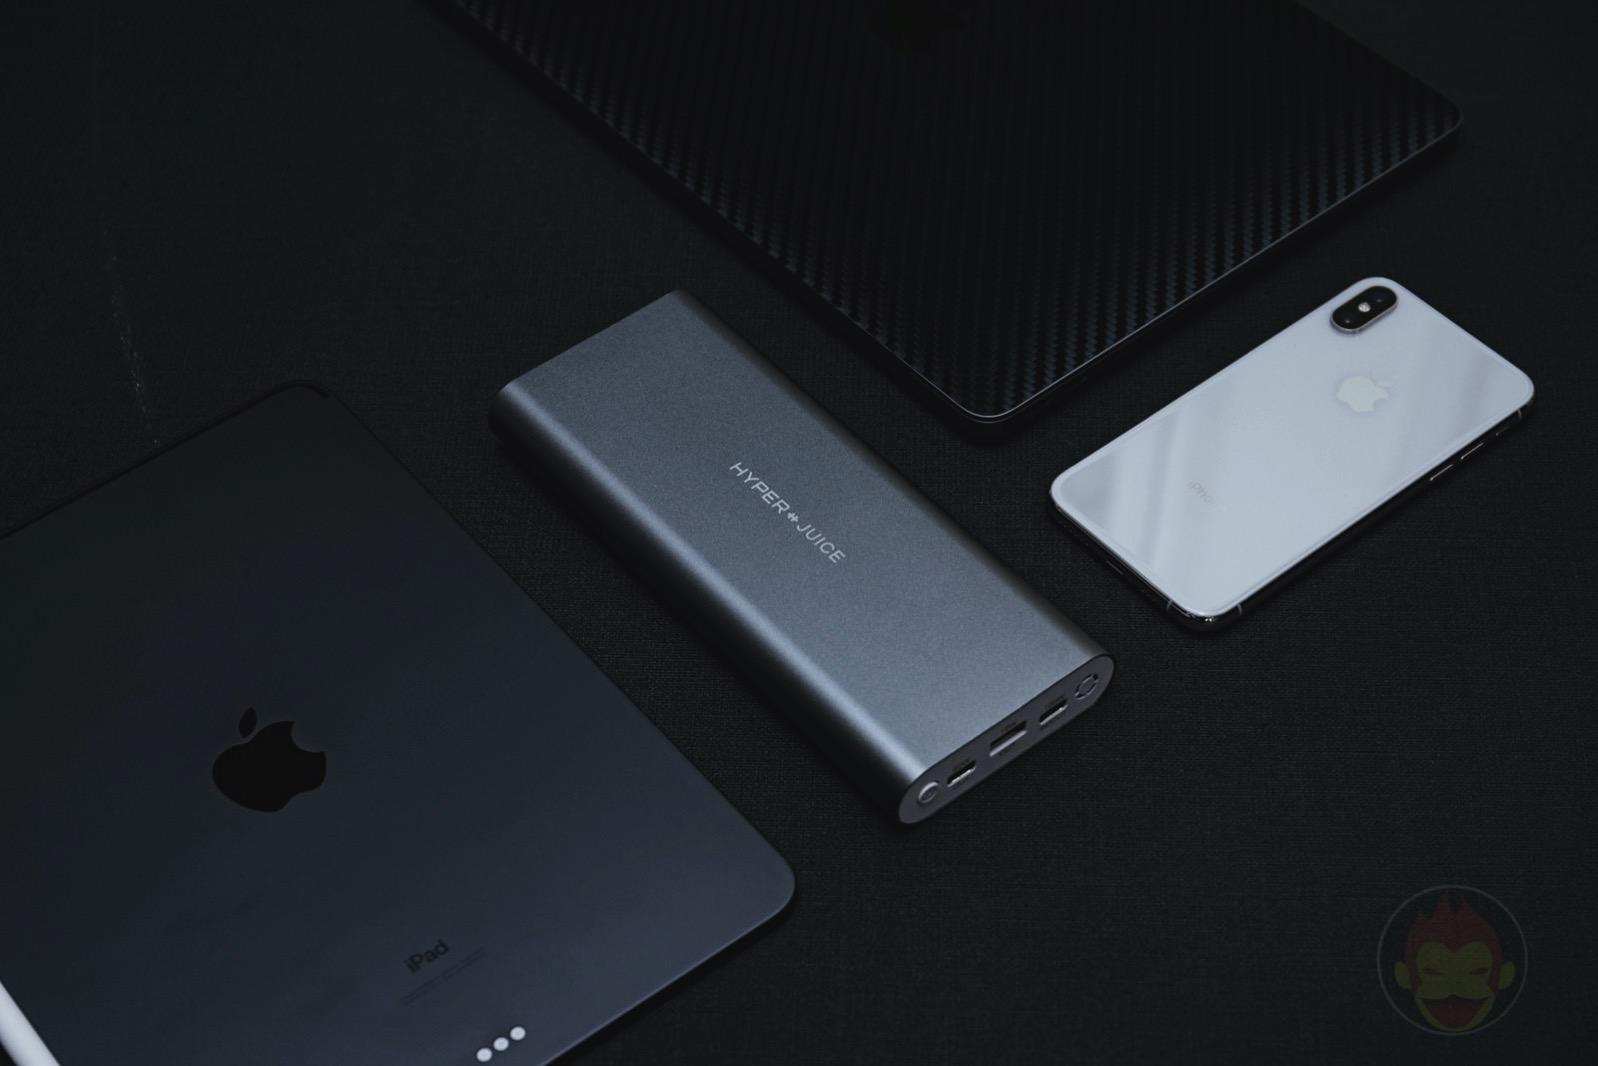 HyperJuice-100W-Mobile-Battery-Review-04.jpg